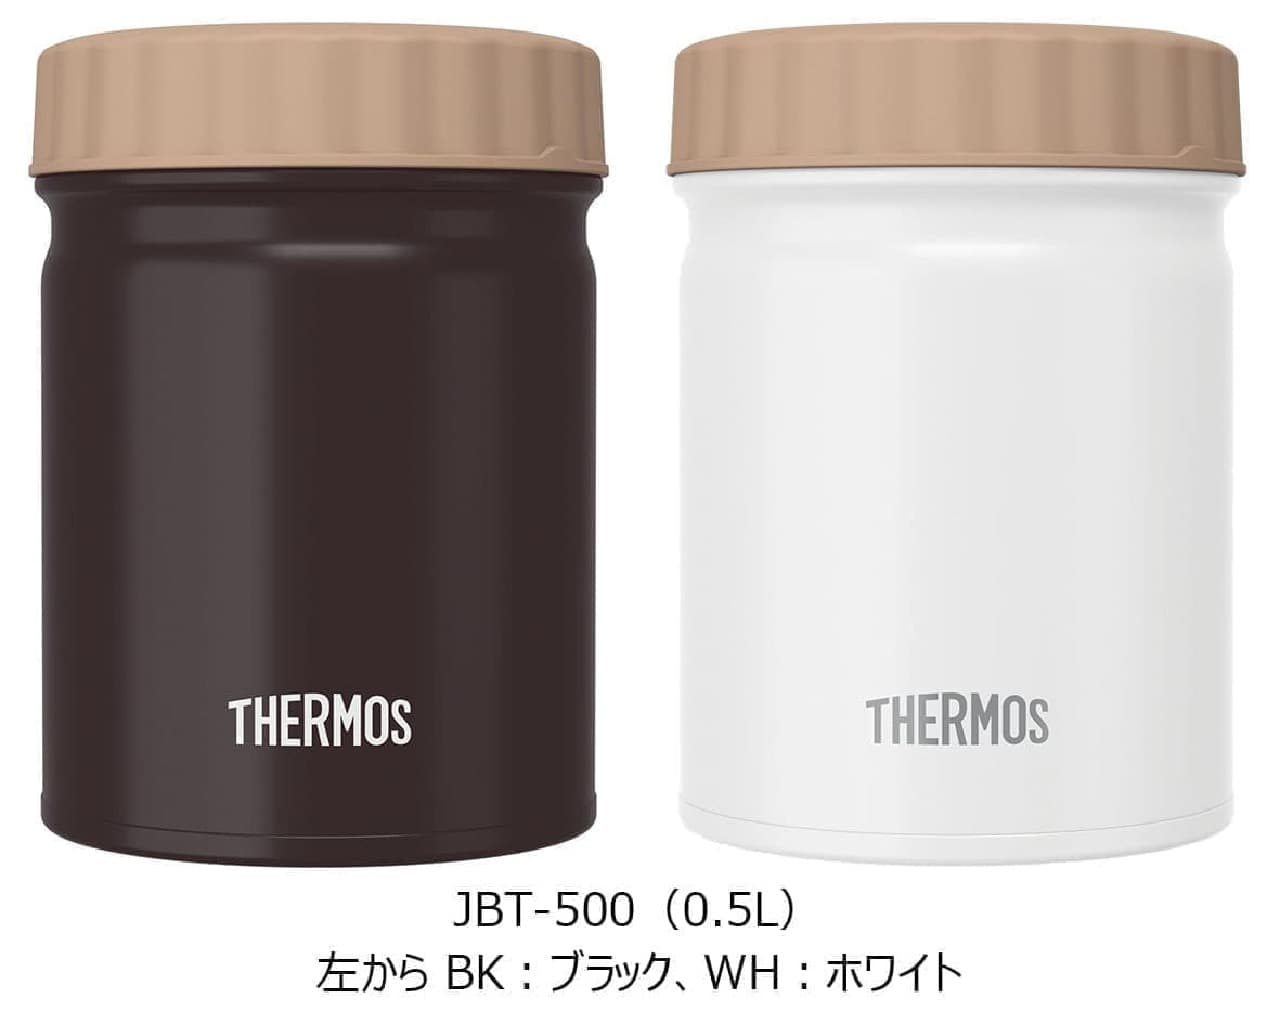 thermos-soup-jar-renewal-2019